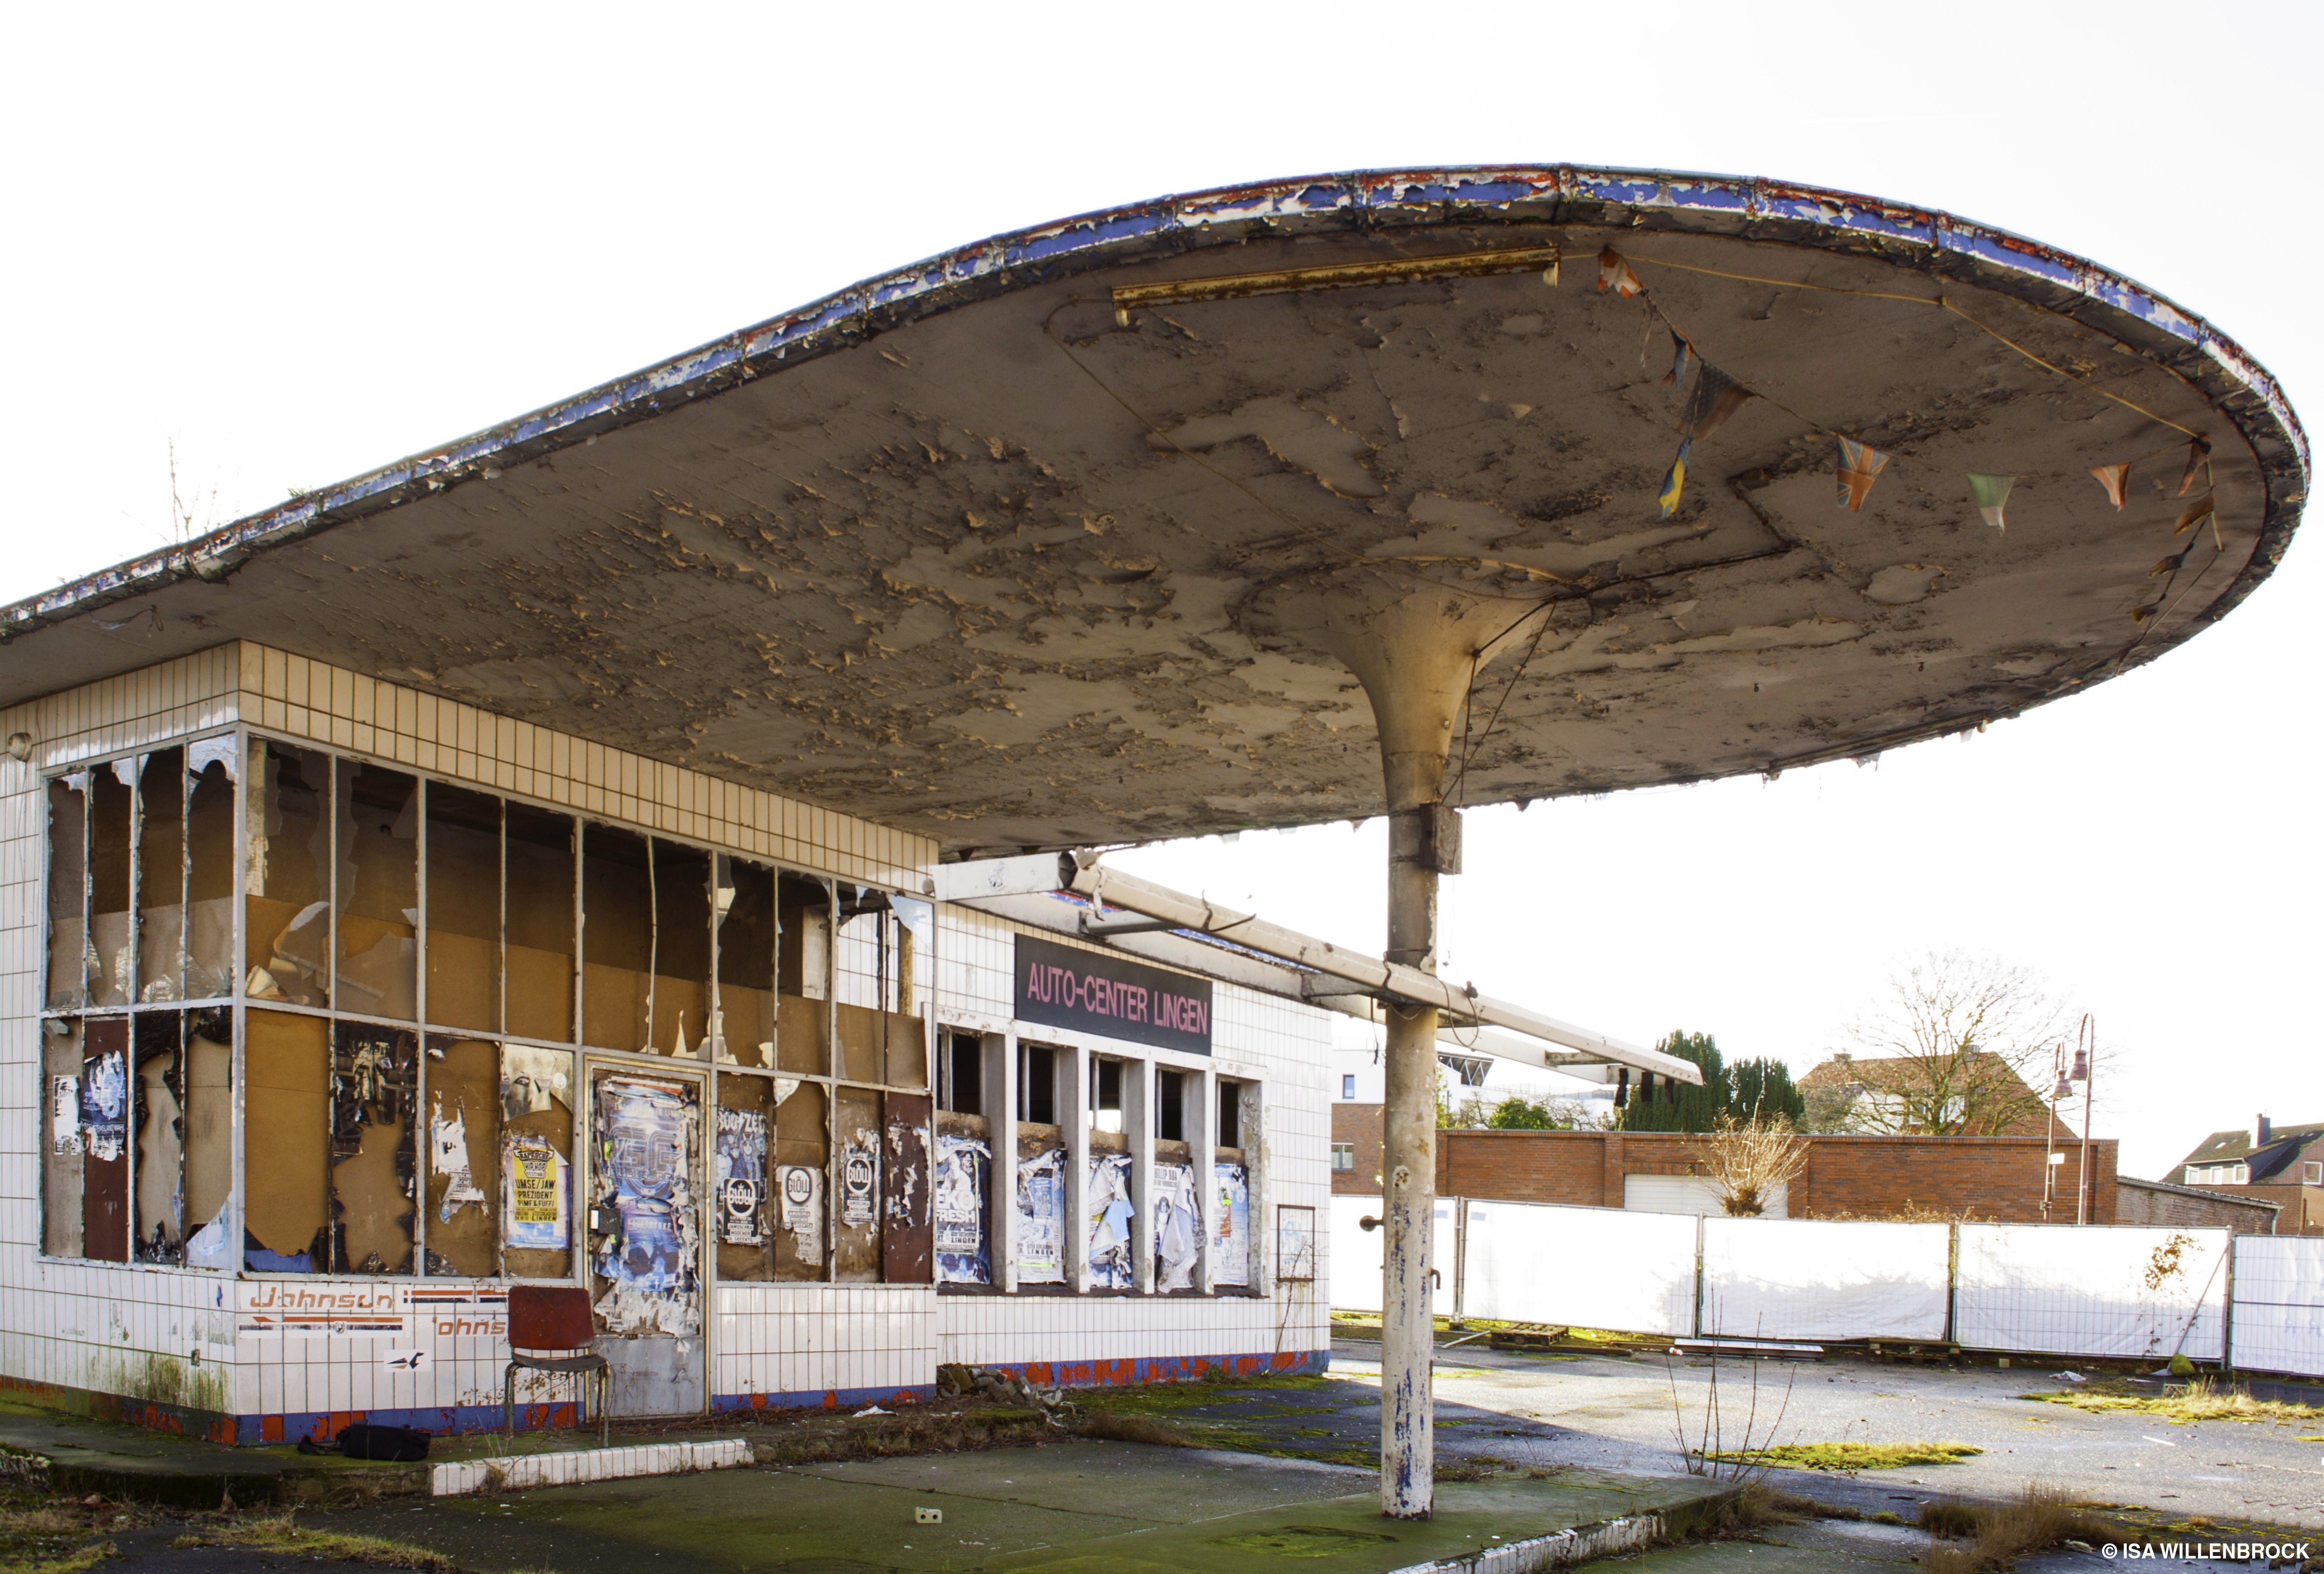 Die alte NITAG-Tankstelle in Lingen vor dem Umbau